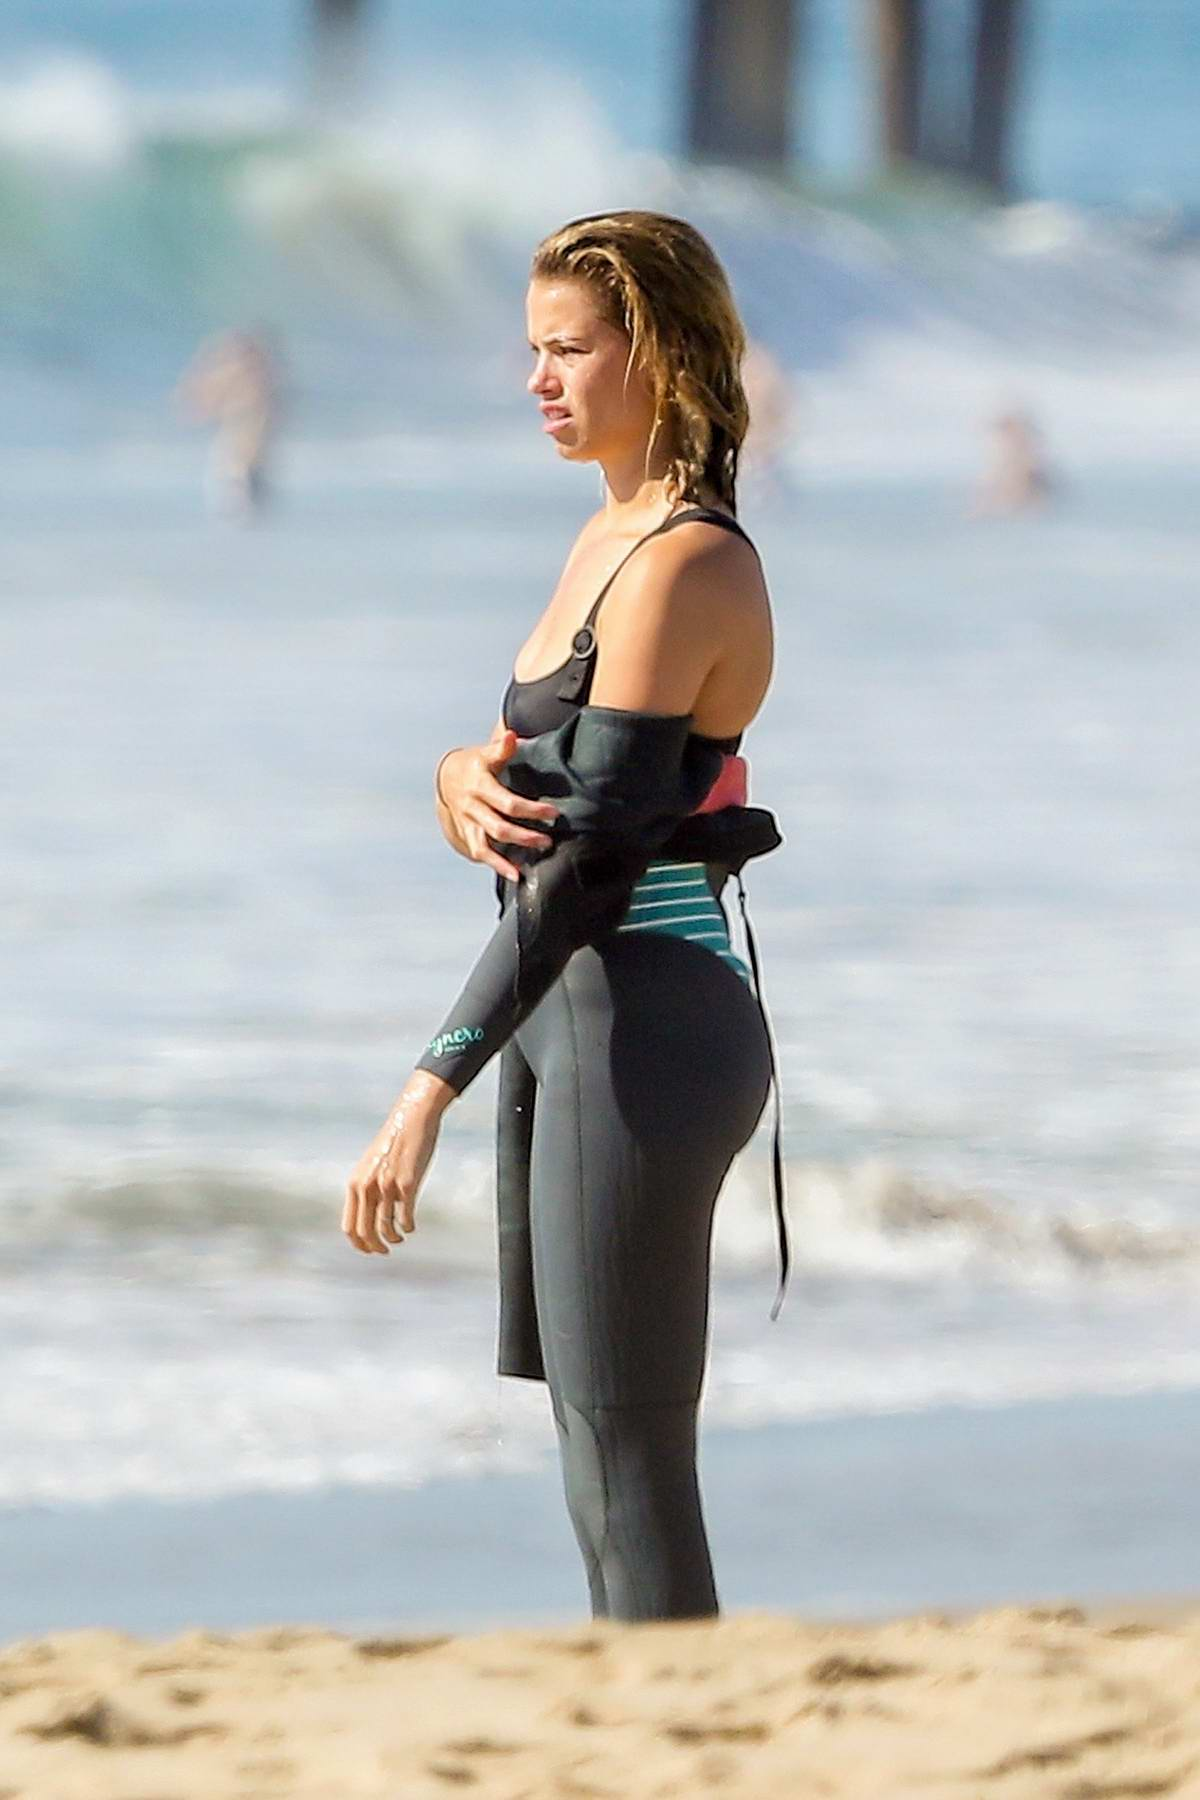 Hailey Clauson and boyfriend Jullien Harrera enjoys a day of surfing in Malibu, California